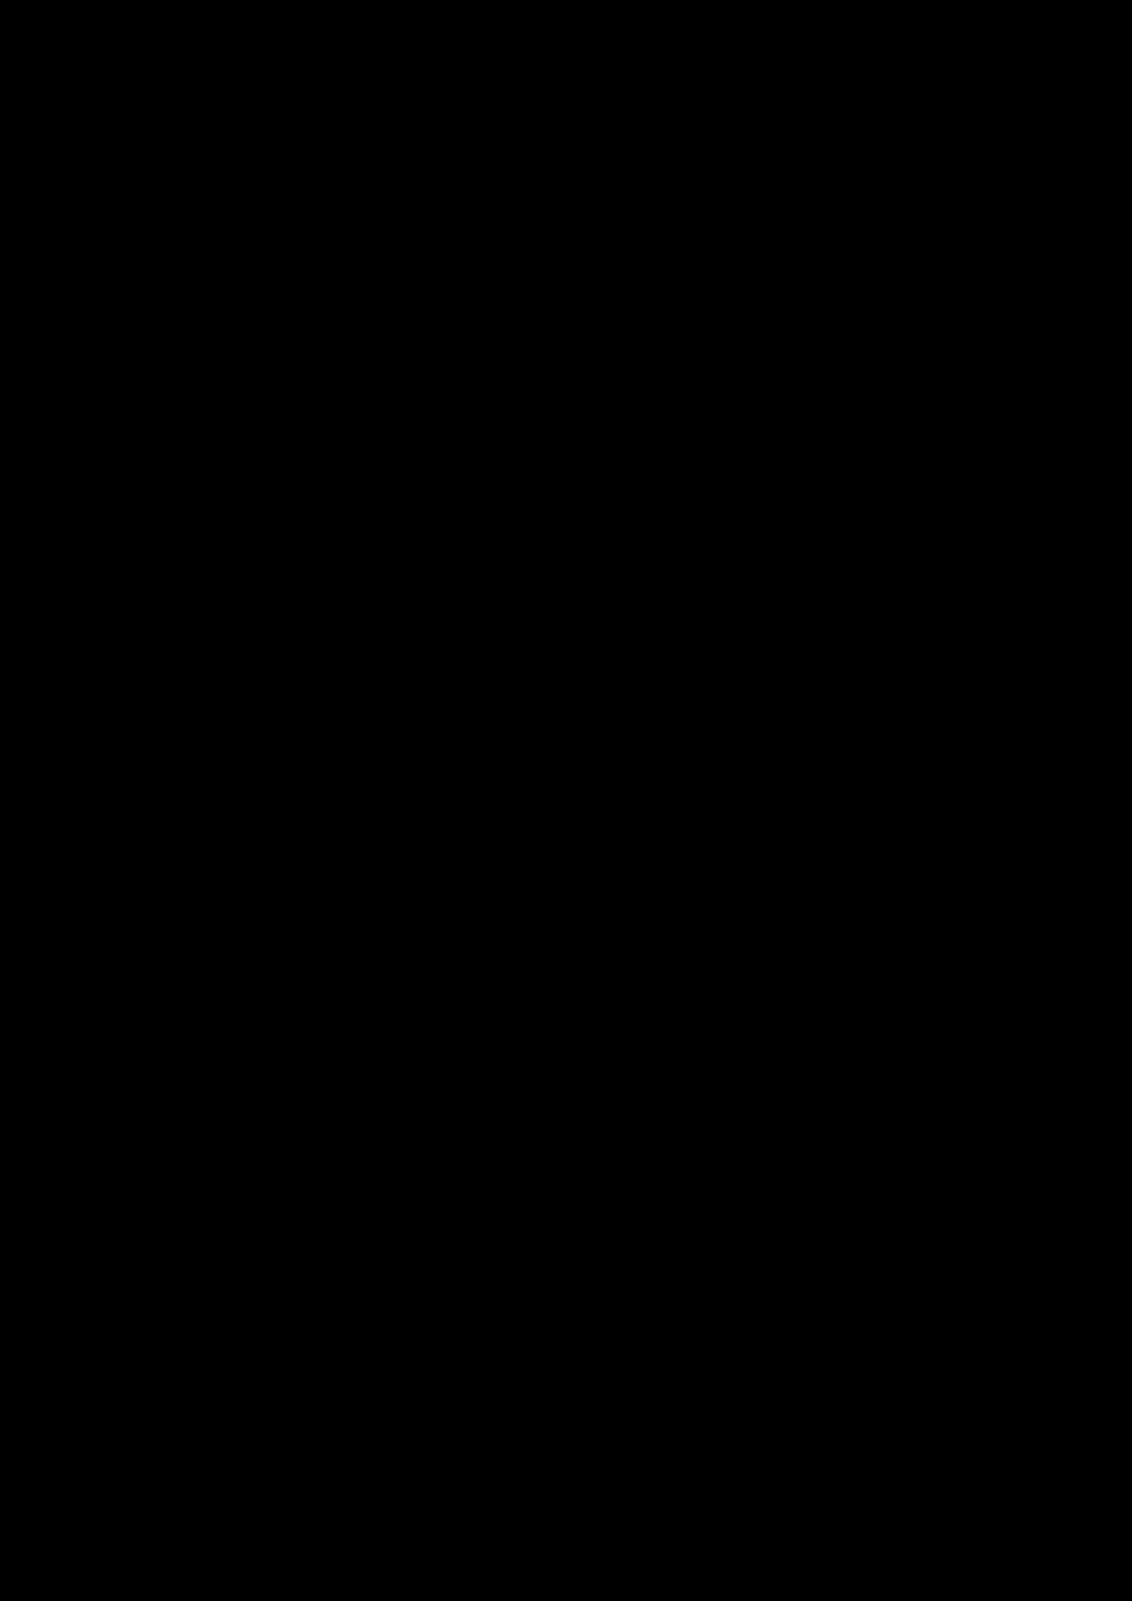 18 berez slide, Image 8